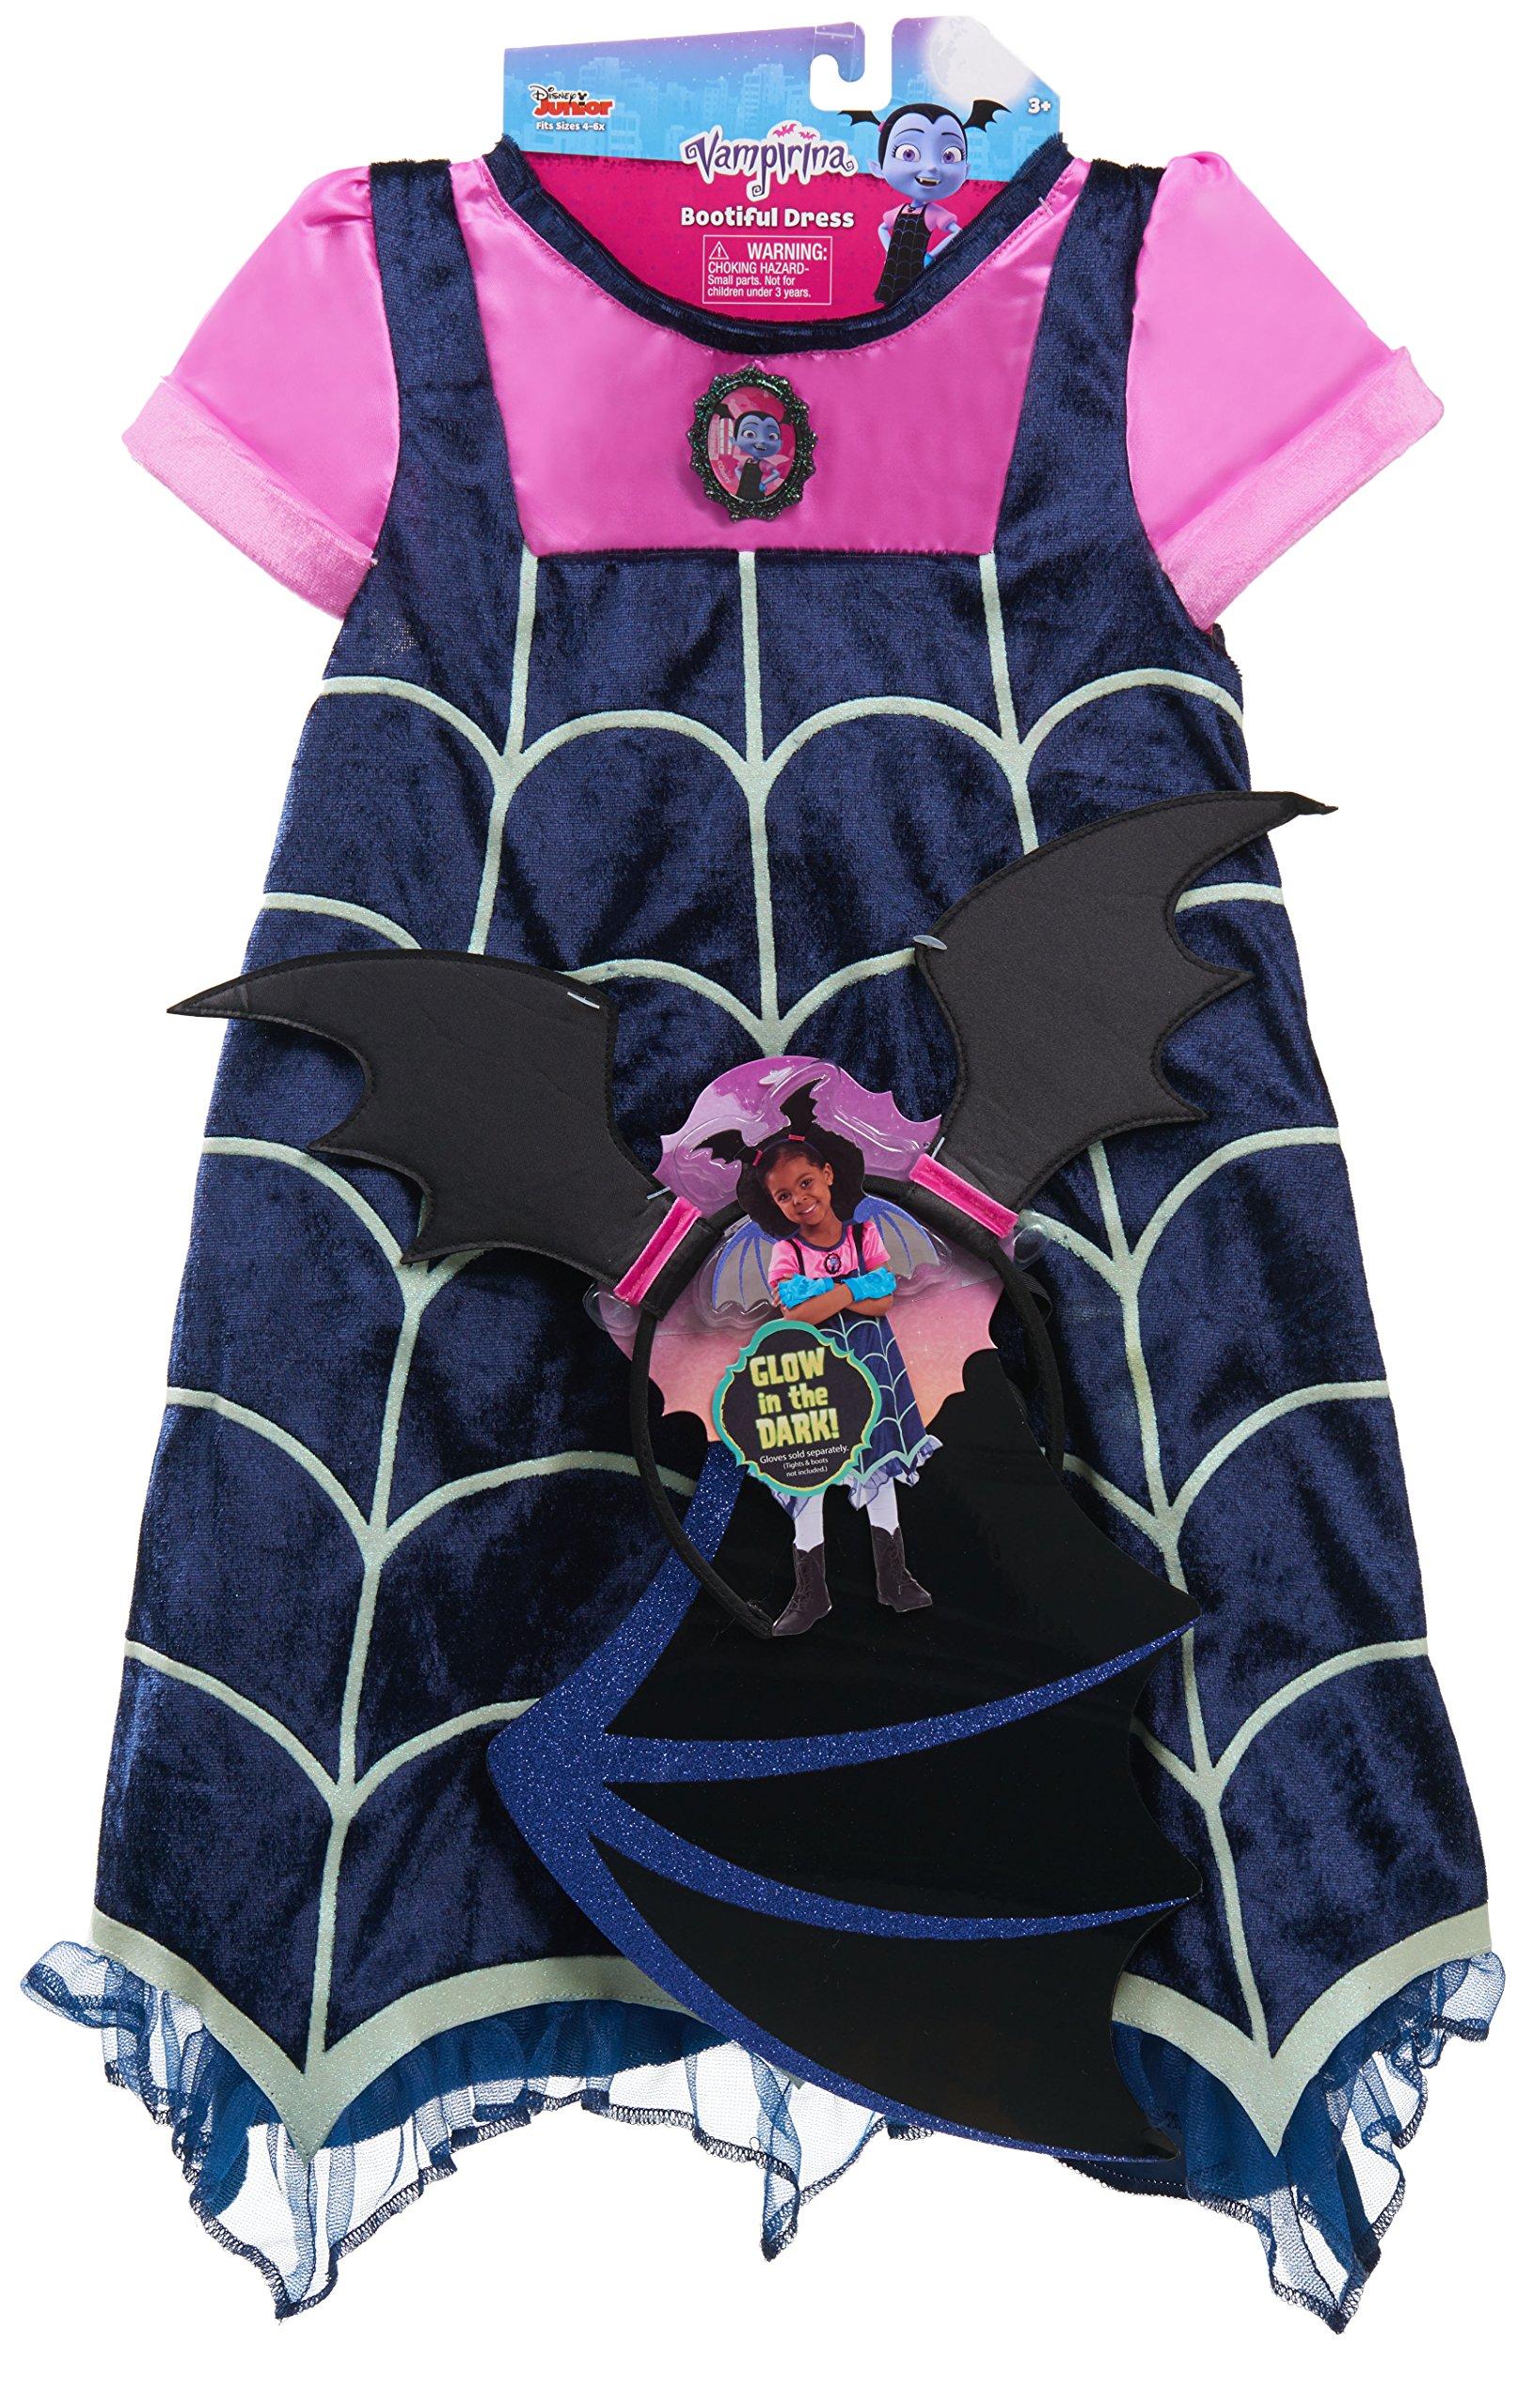 Vampirina 78050 Boo-Tiful Dress